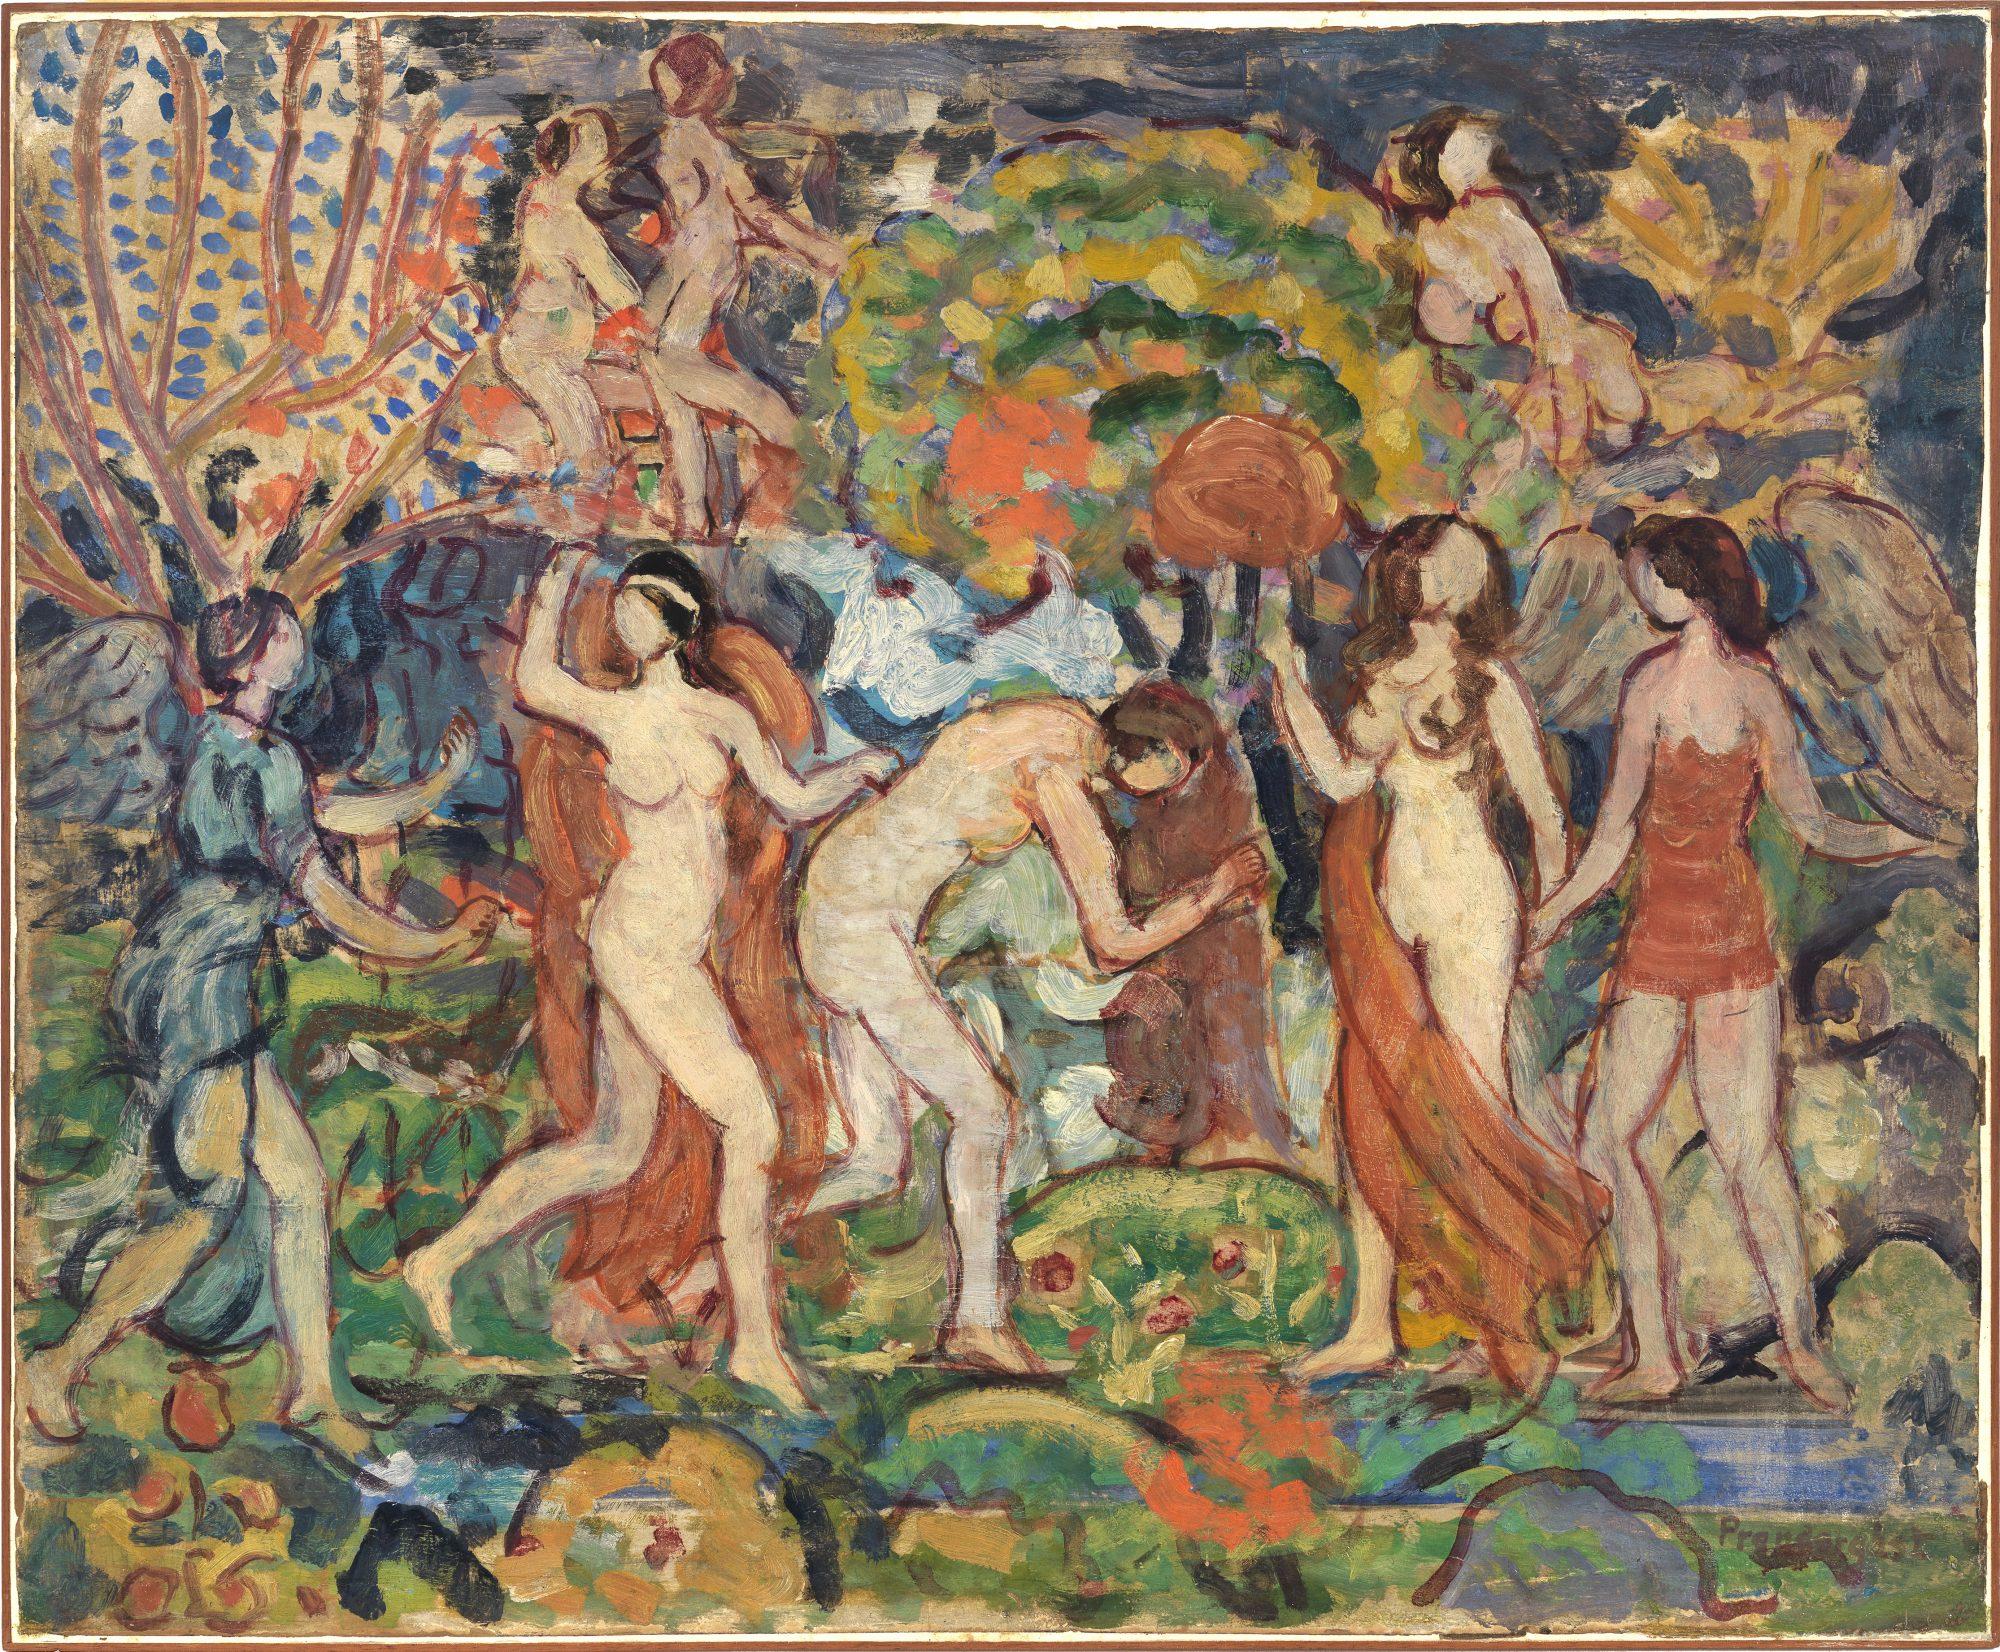 Maurice Brazil Prendergast (American, 1858-1924) Fantasy, ca. 1914-1915, Oil on paper mounted on panel, 21 15/16 x 26 in. Gift of Mrs. Charles Prendergast, 85.45